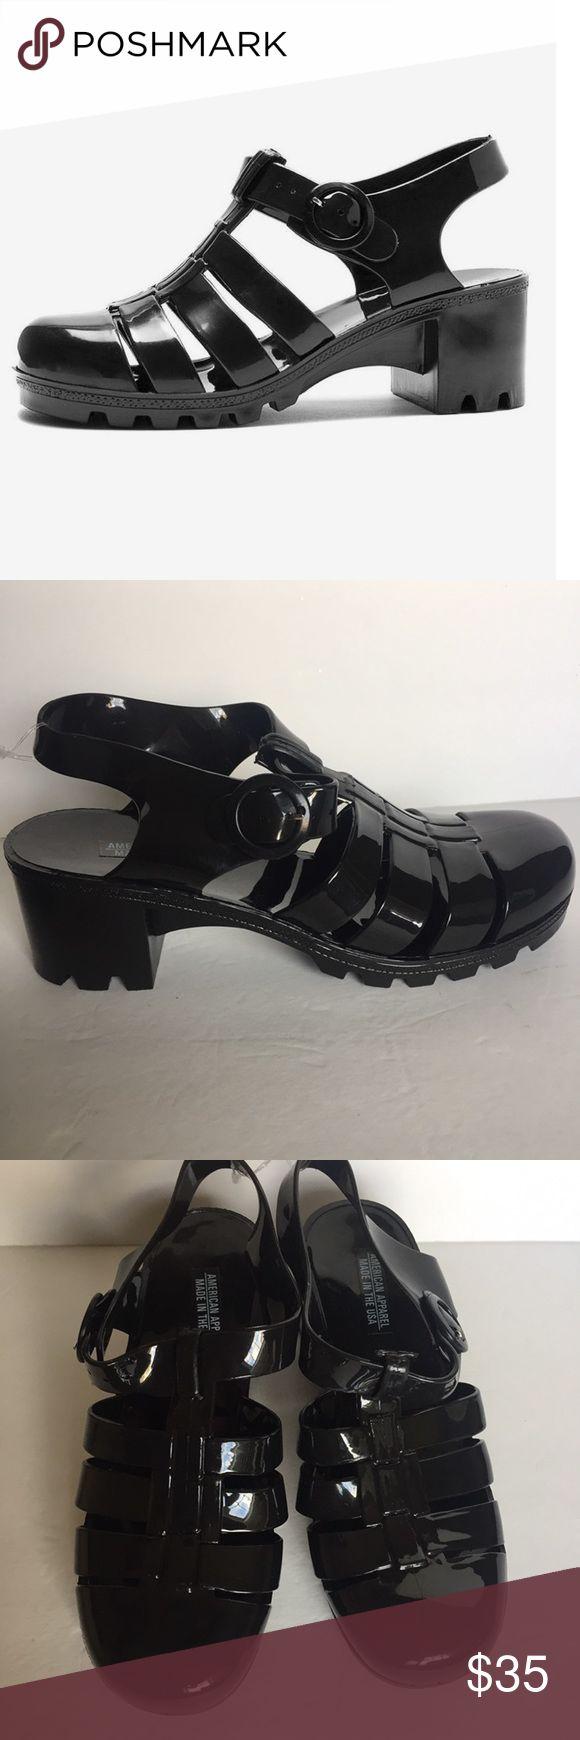 Black jelly sandals american apparel - American Apparel Black Woven Jelly Sandals 10